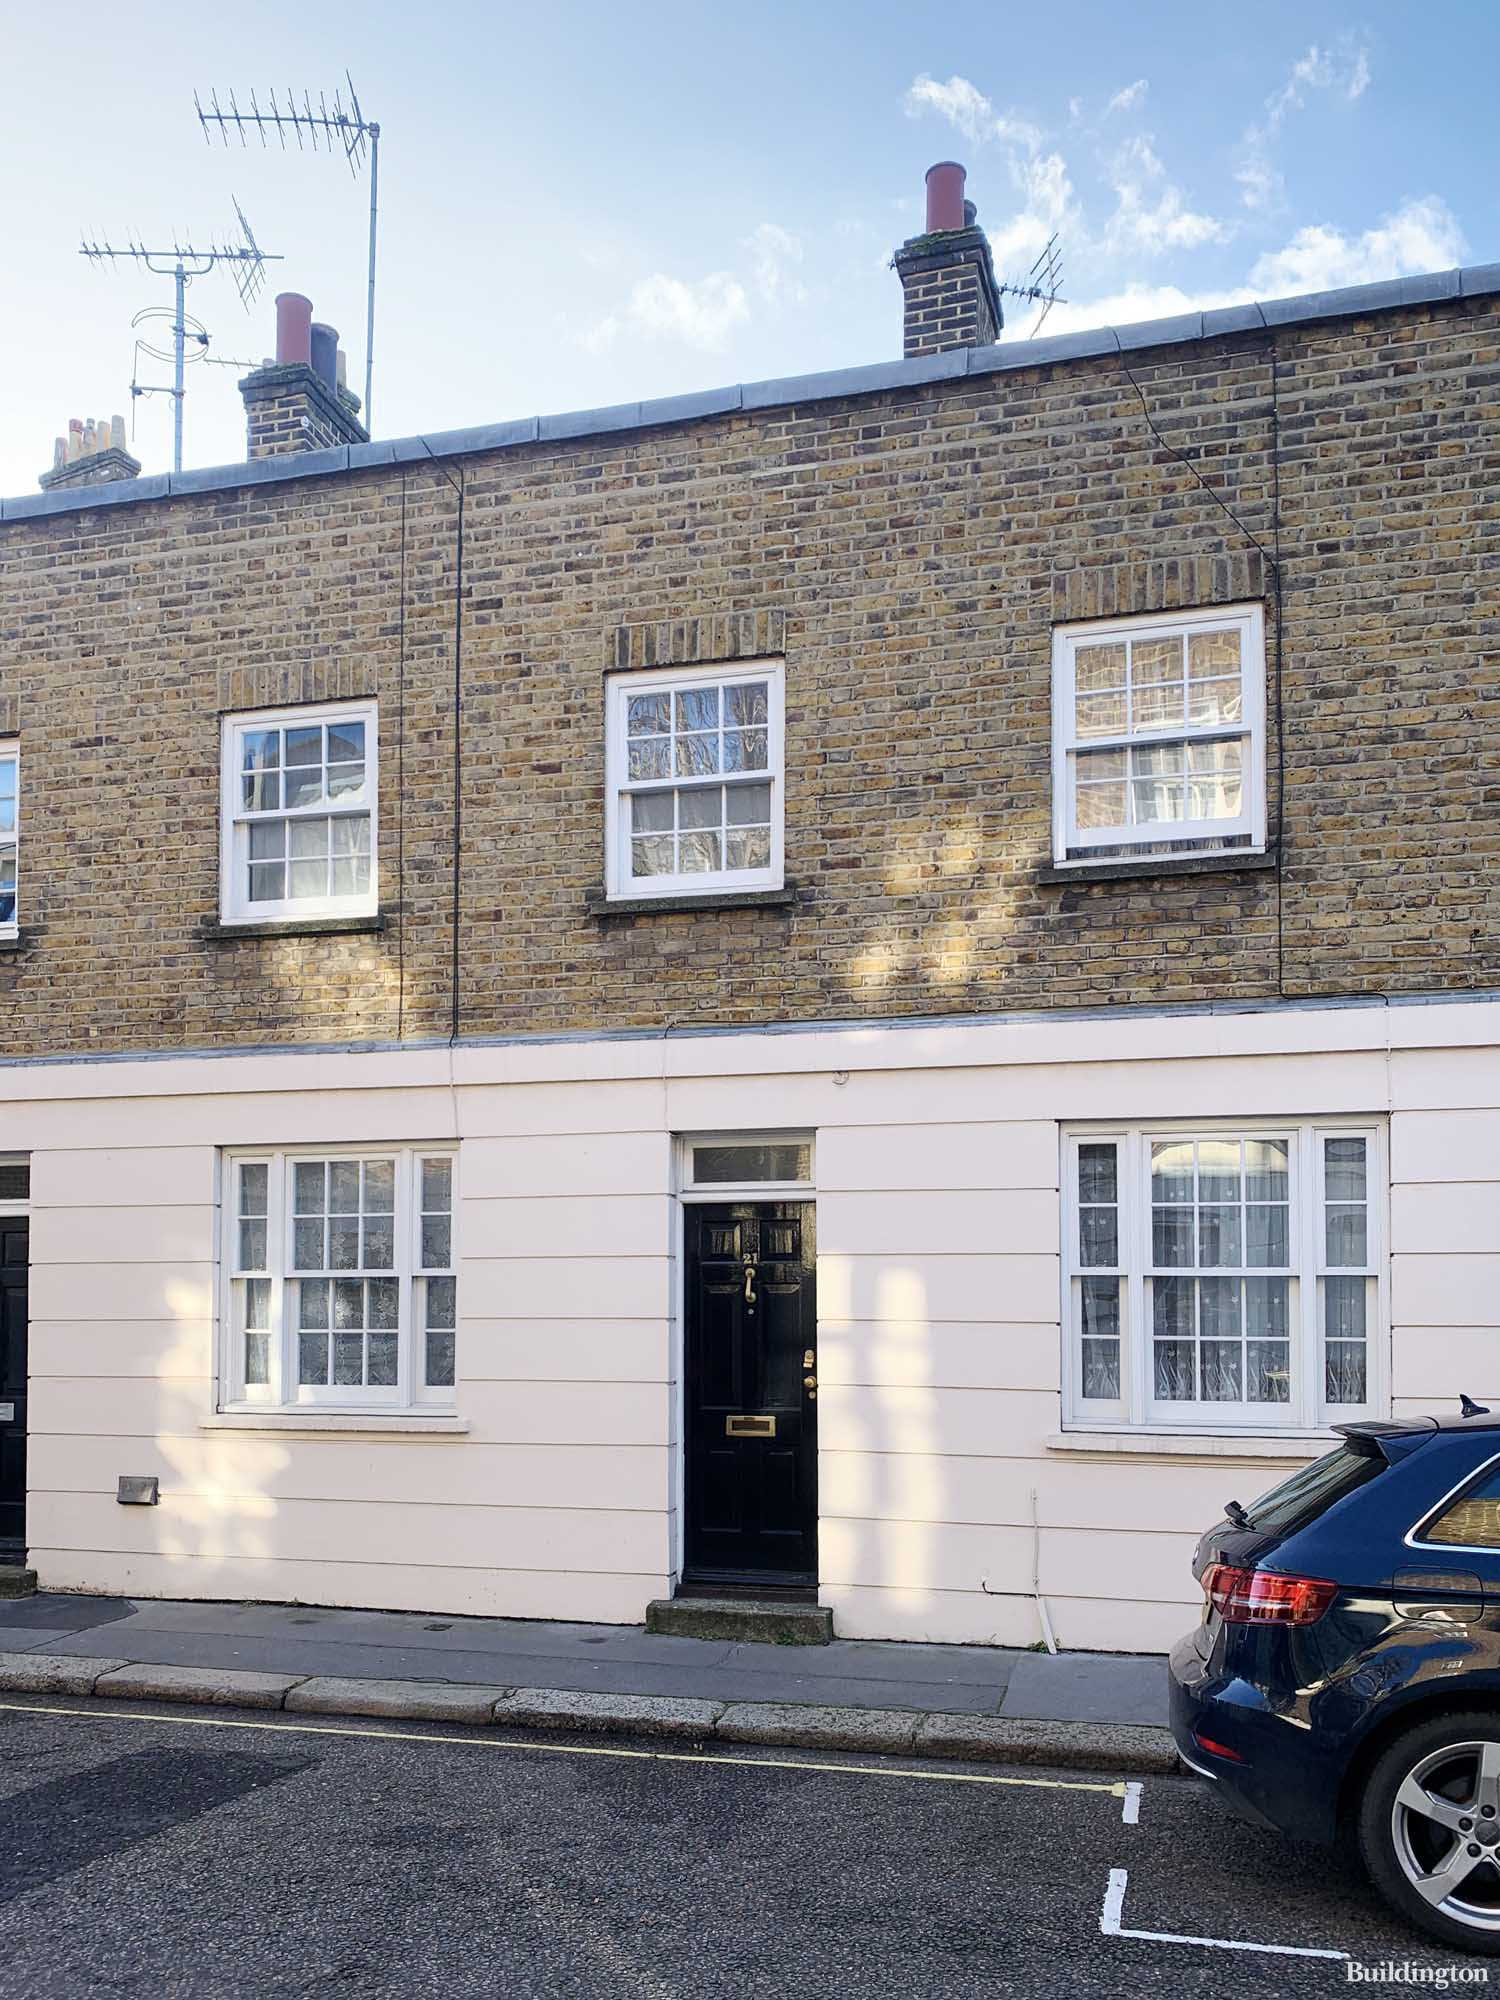 VOZA Developments site on Passmore Street in Belgravia, London SW1.